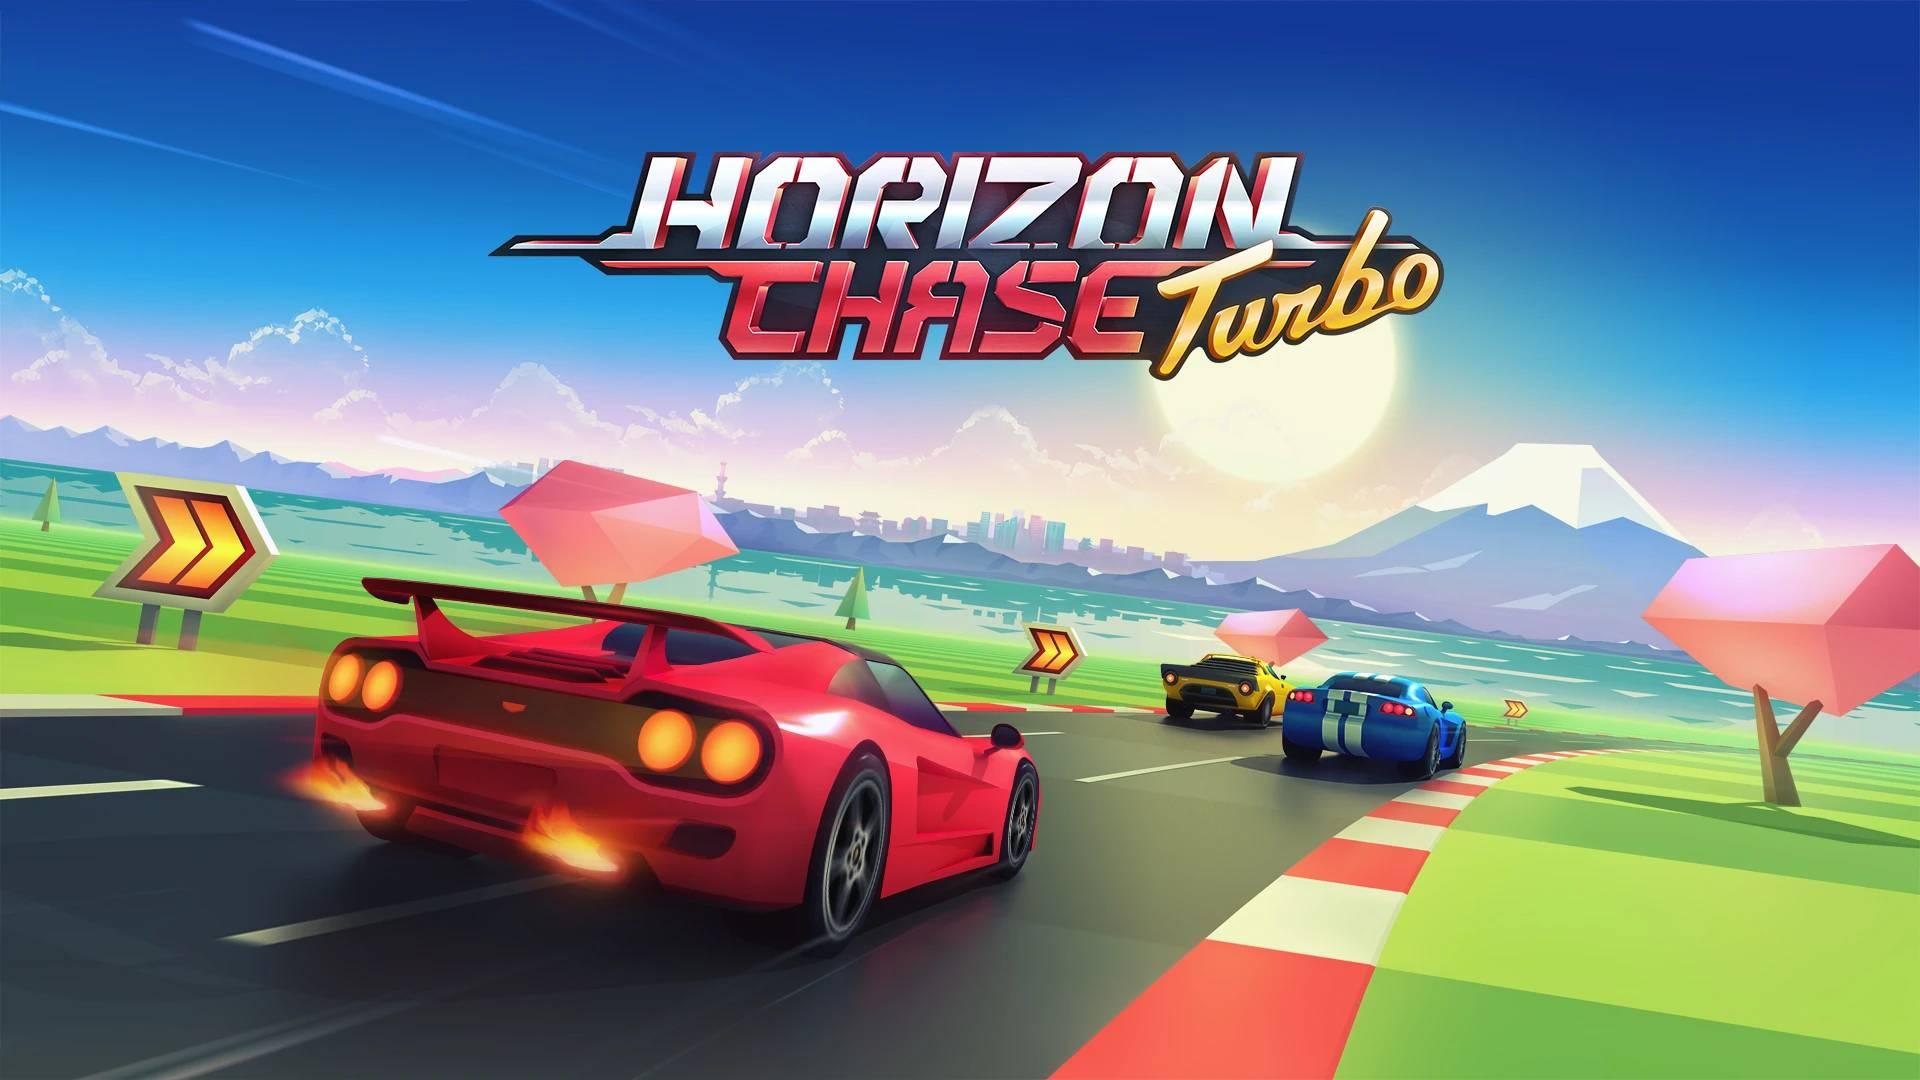 Horizon Chase Turbo PS Vita